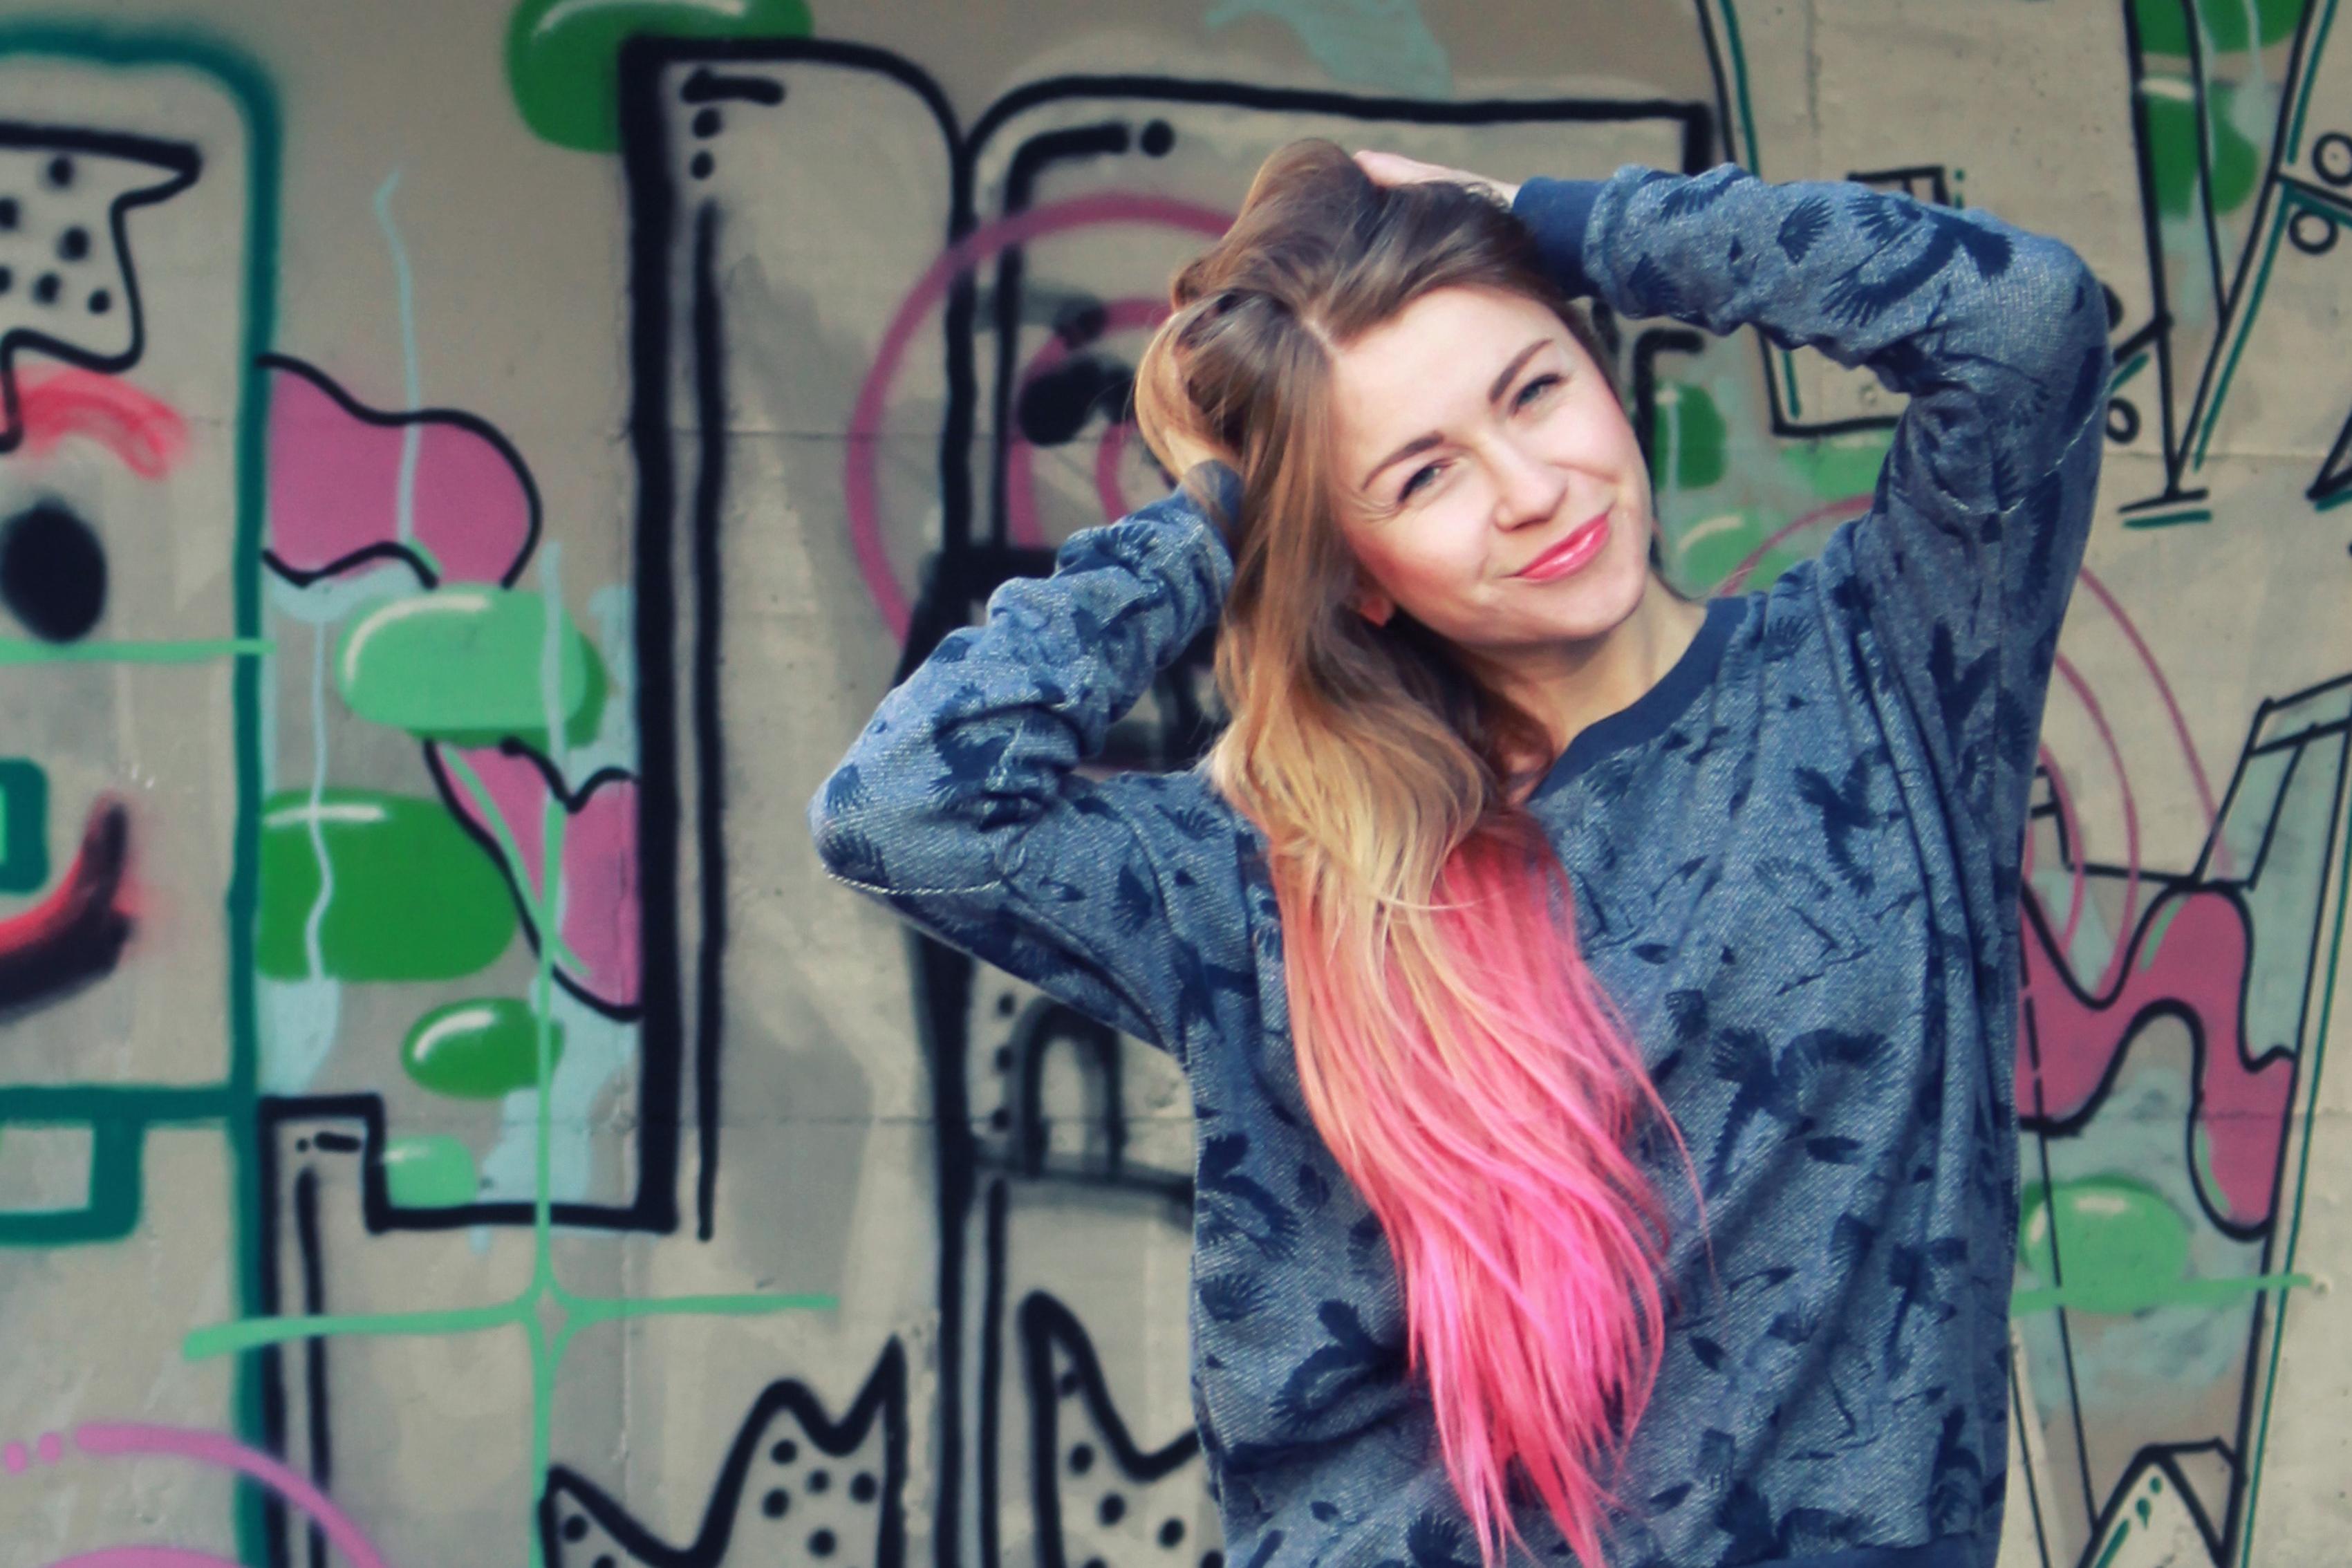 eco_fashion_outfit_09_06_